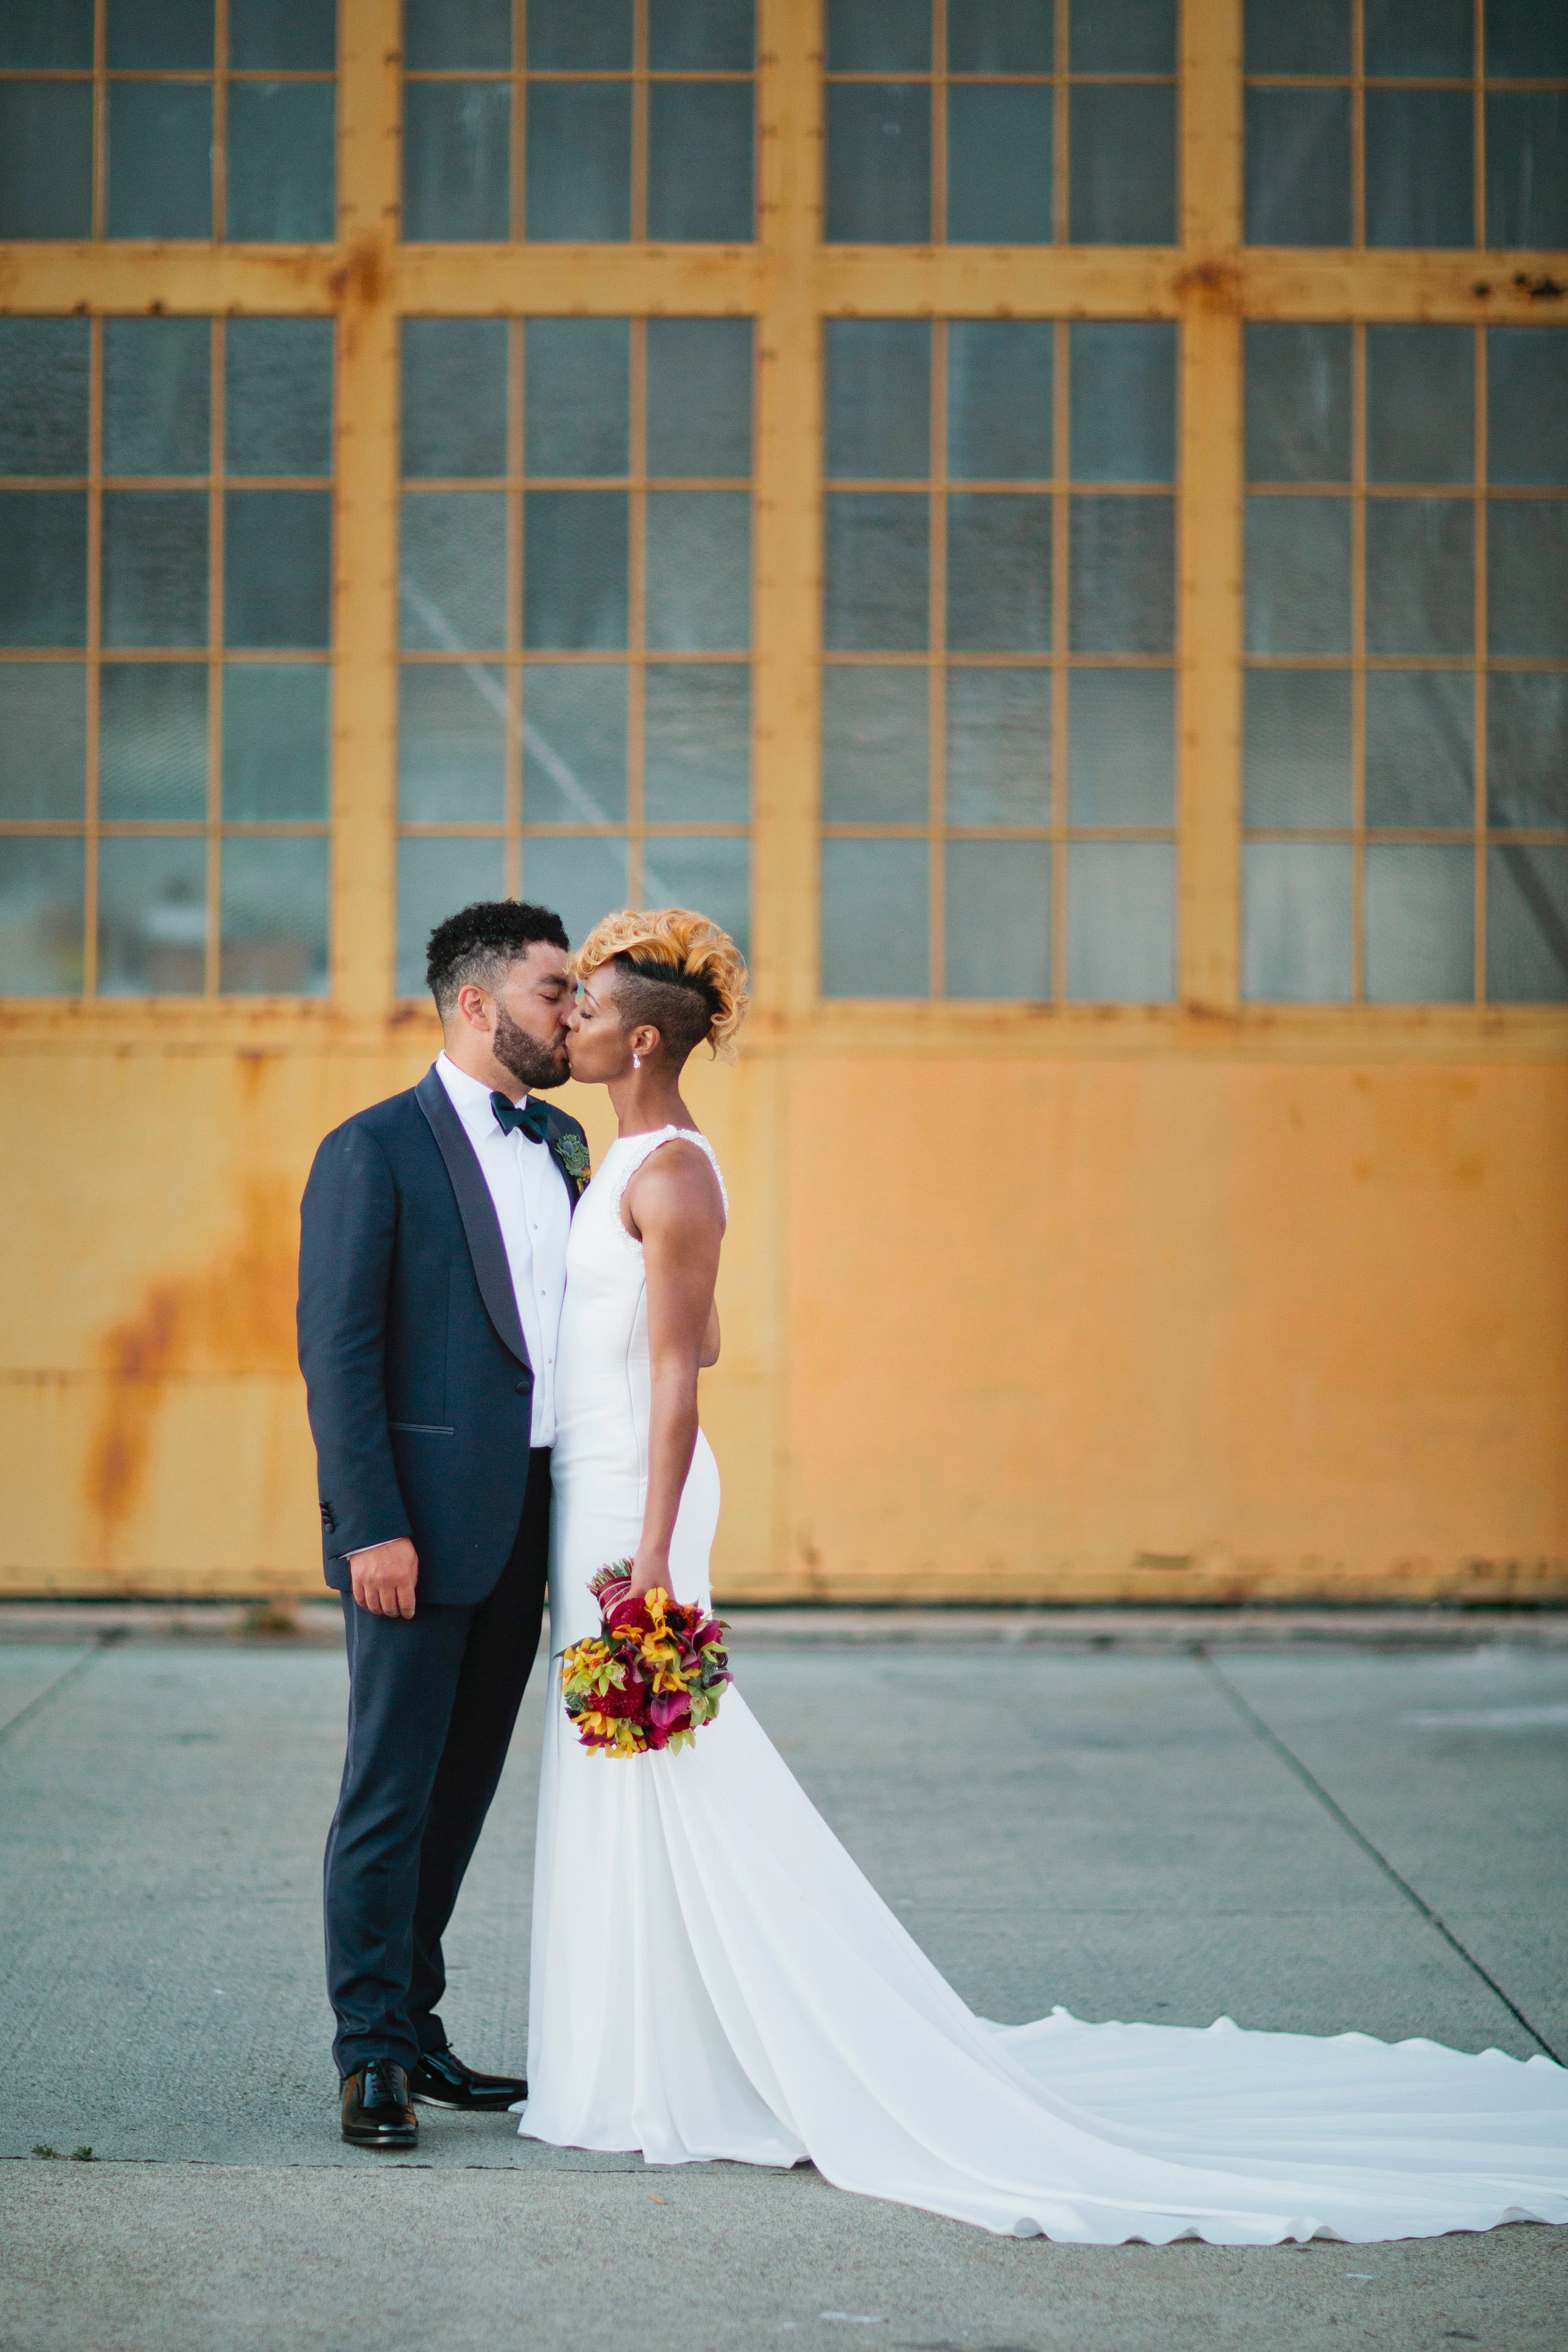 Alameda-Rockwall-Winery-Wedding-042.JPG